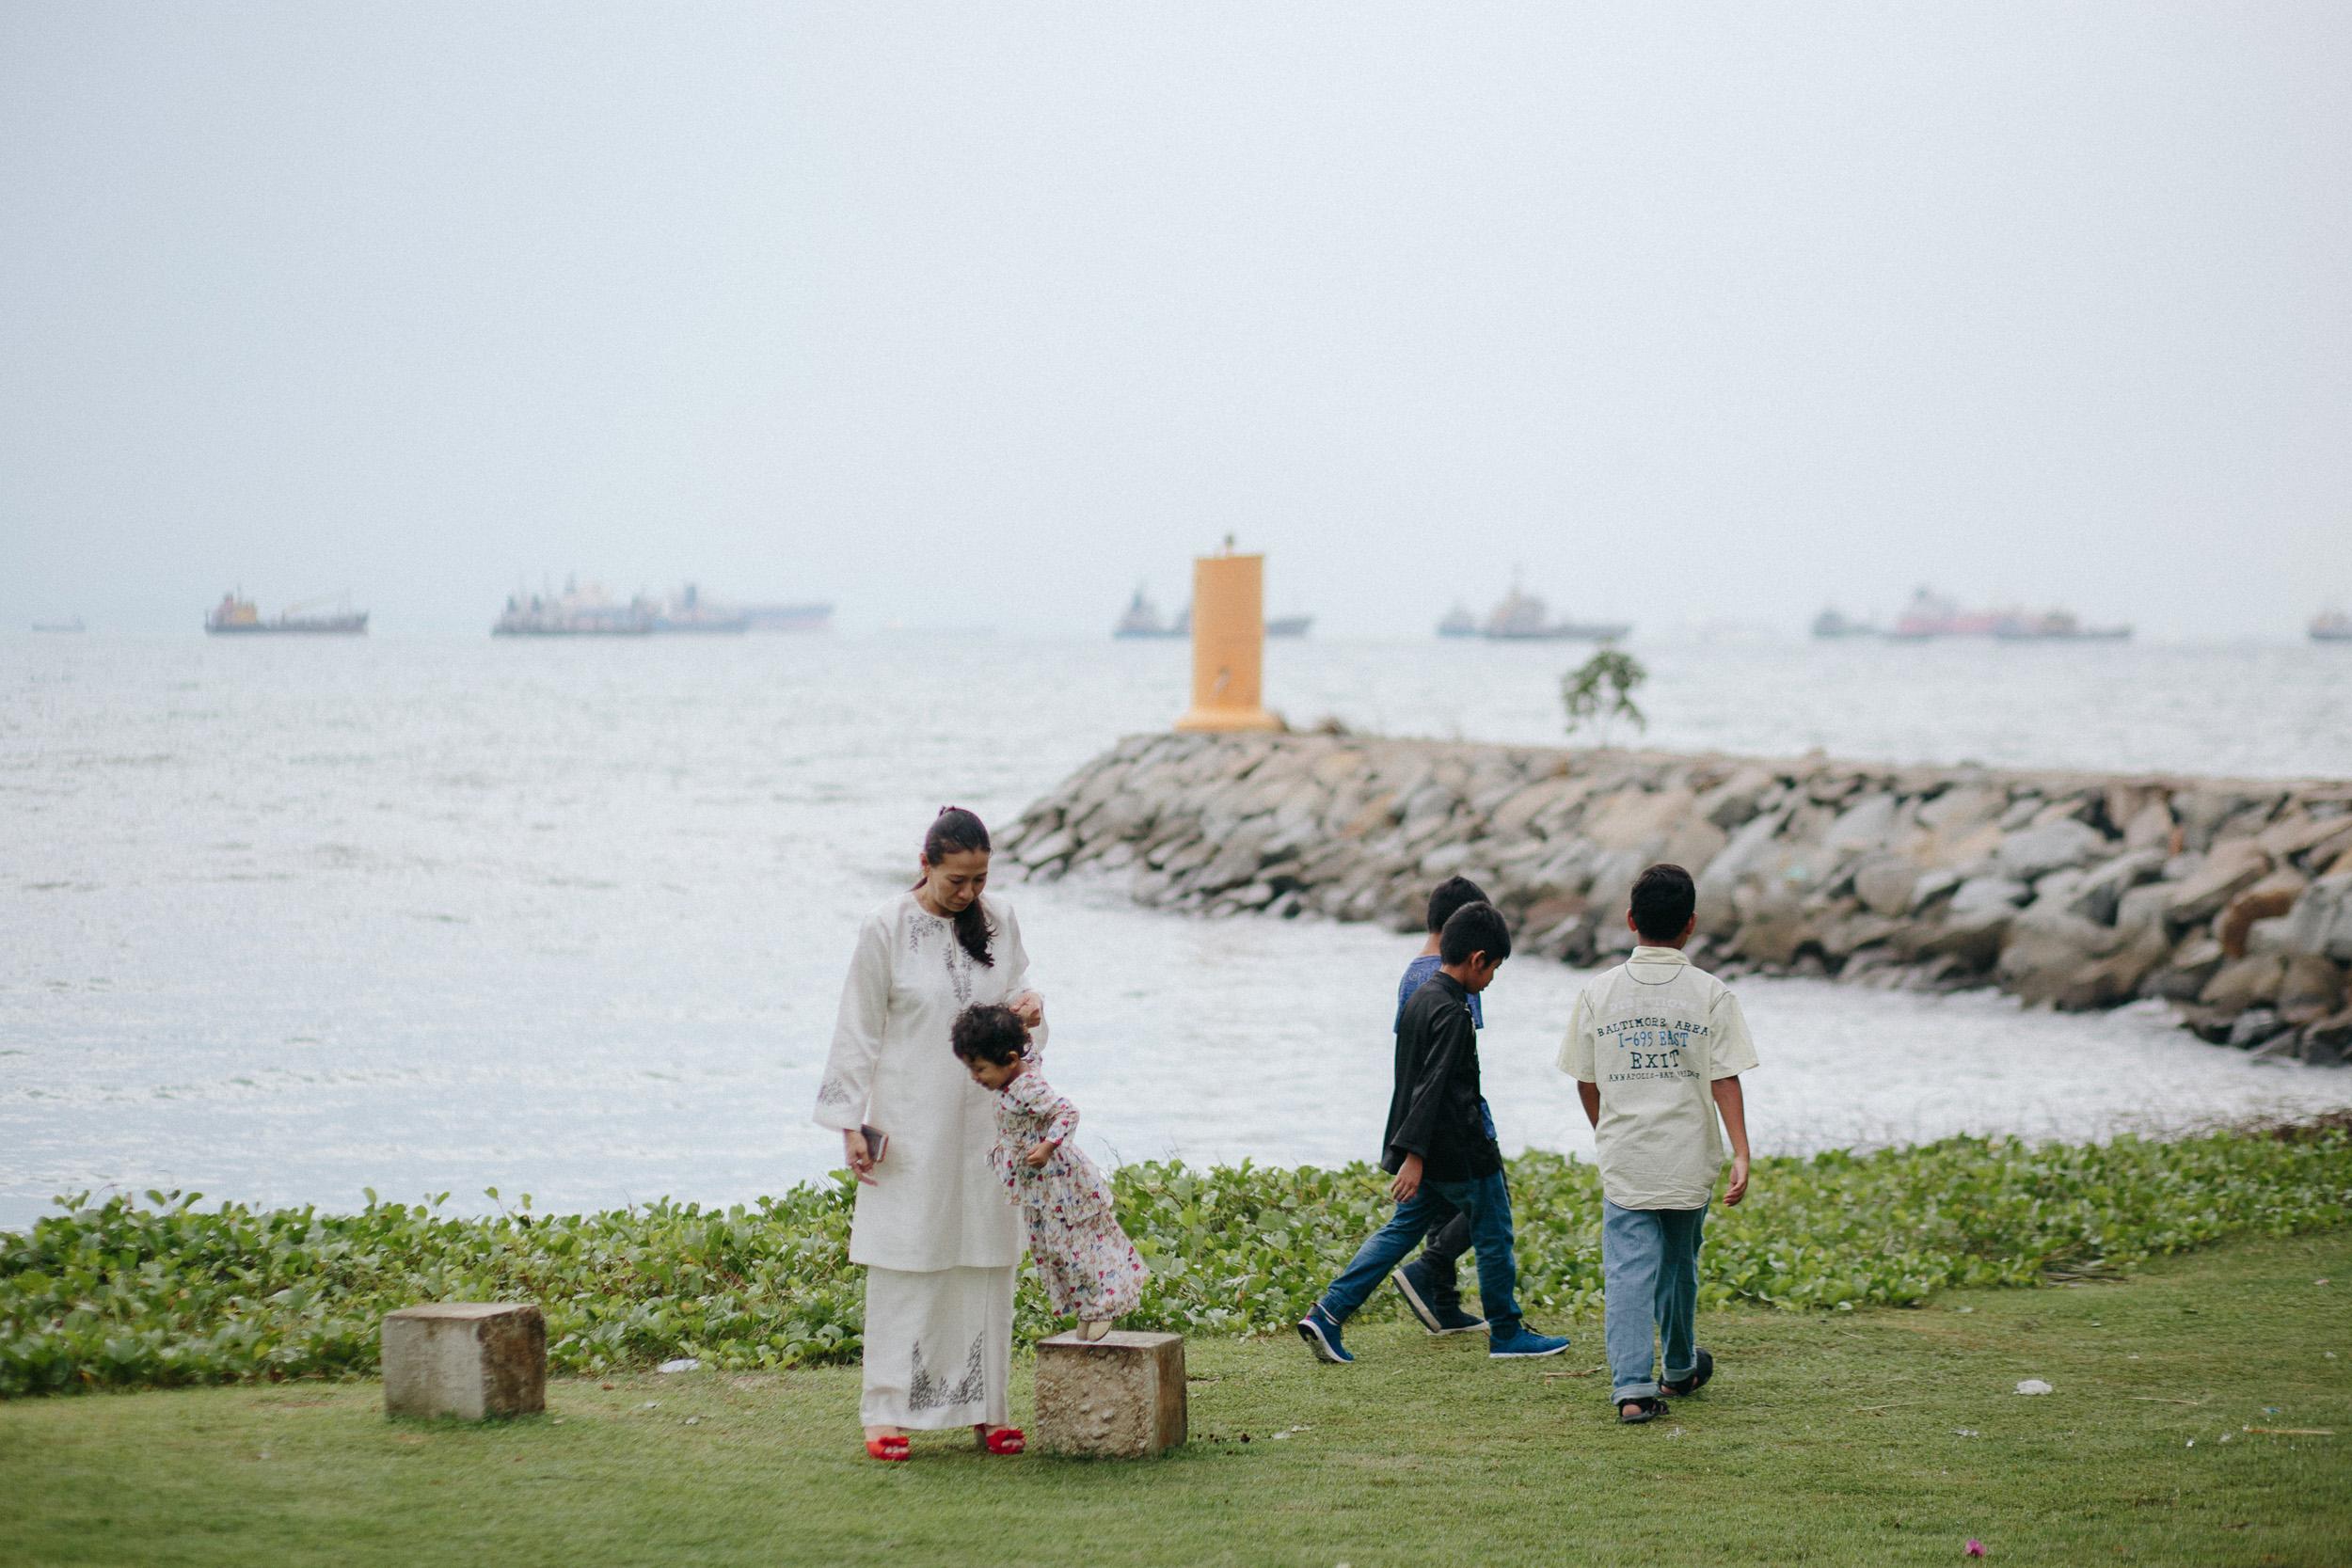 singapore-wedding-photographer-photography-wmt2017-116.jpg